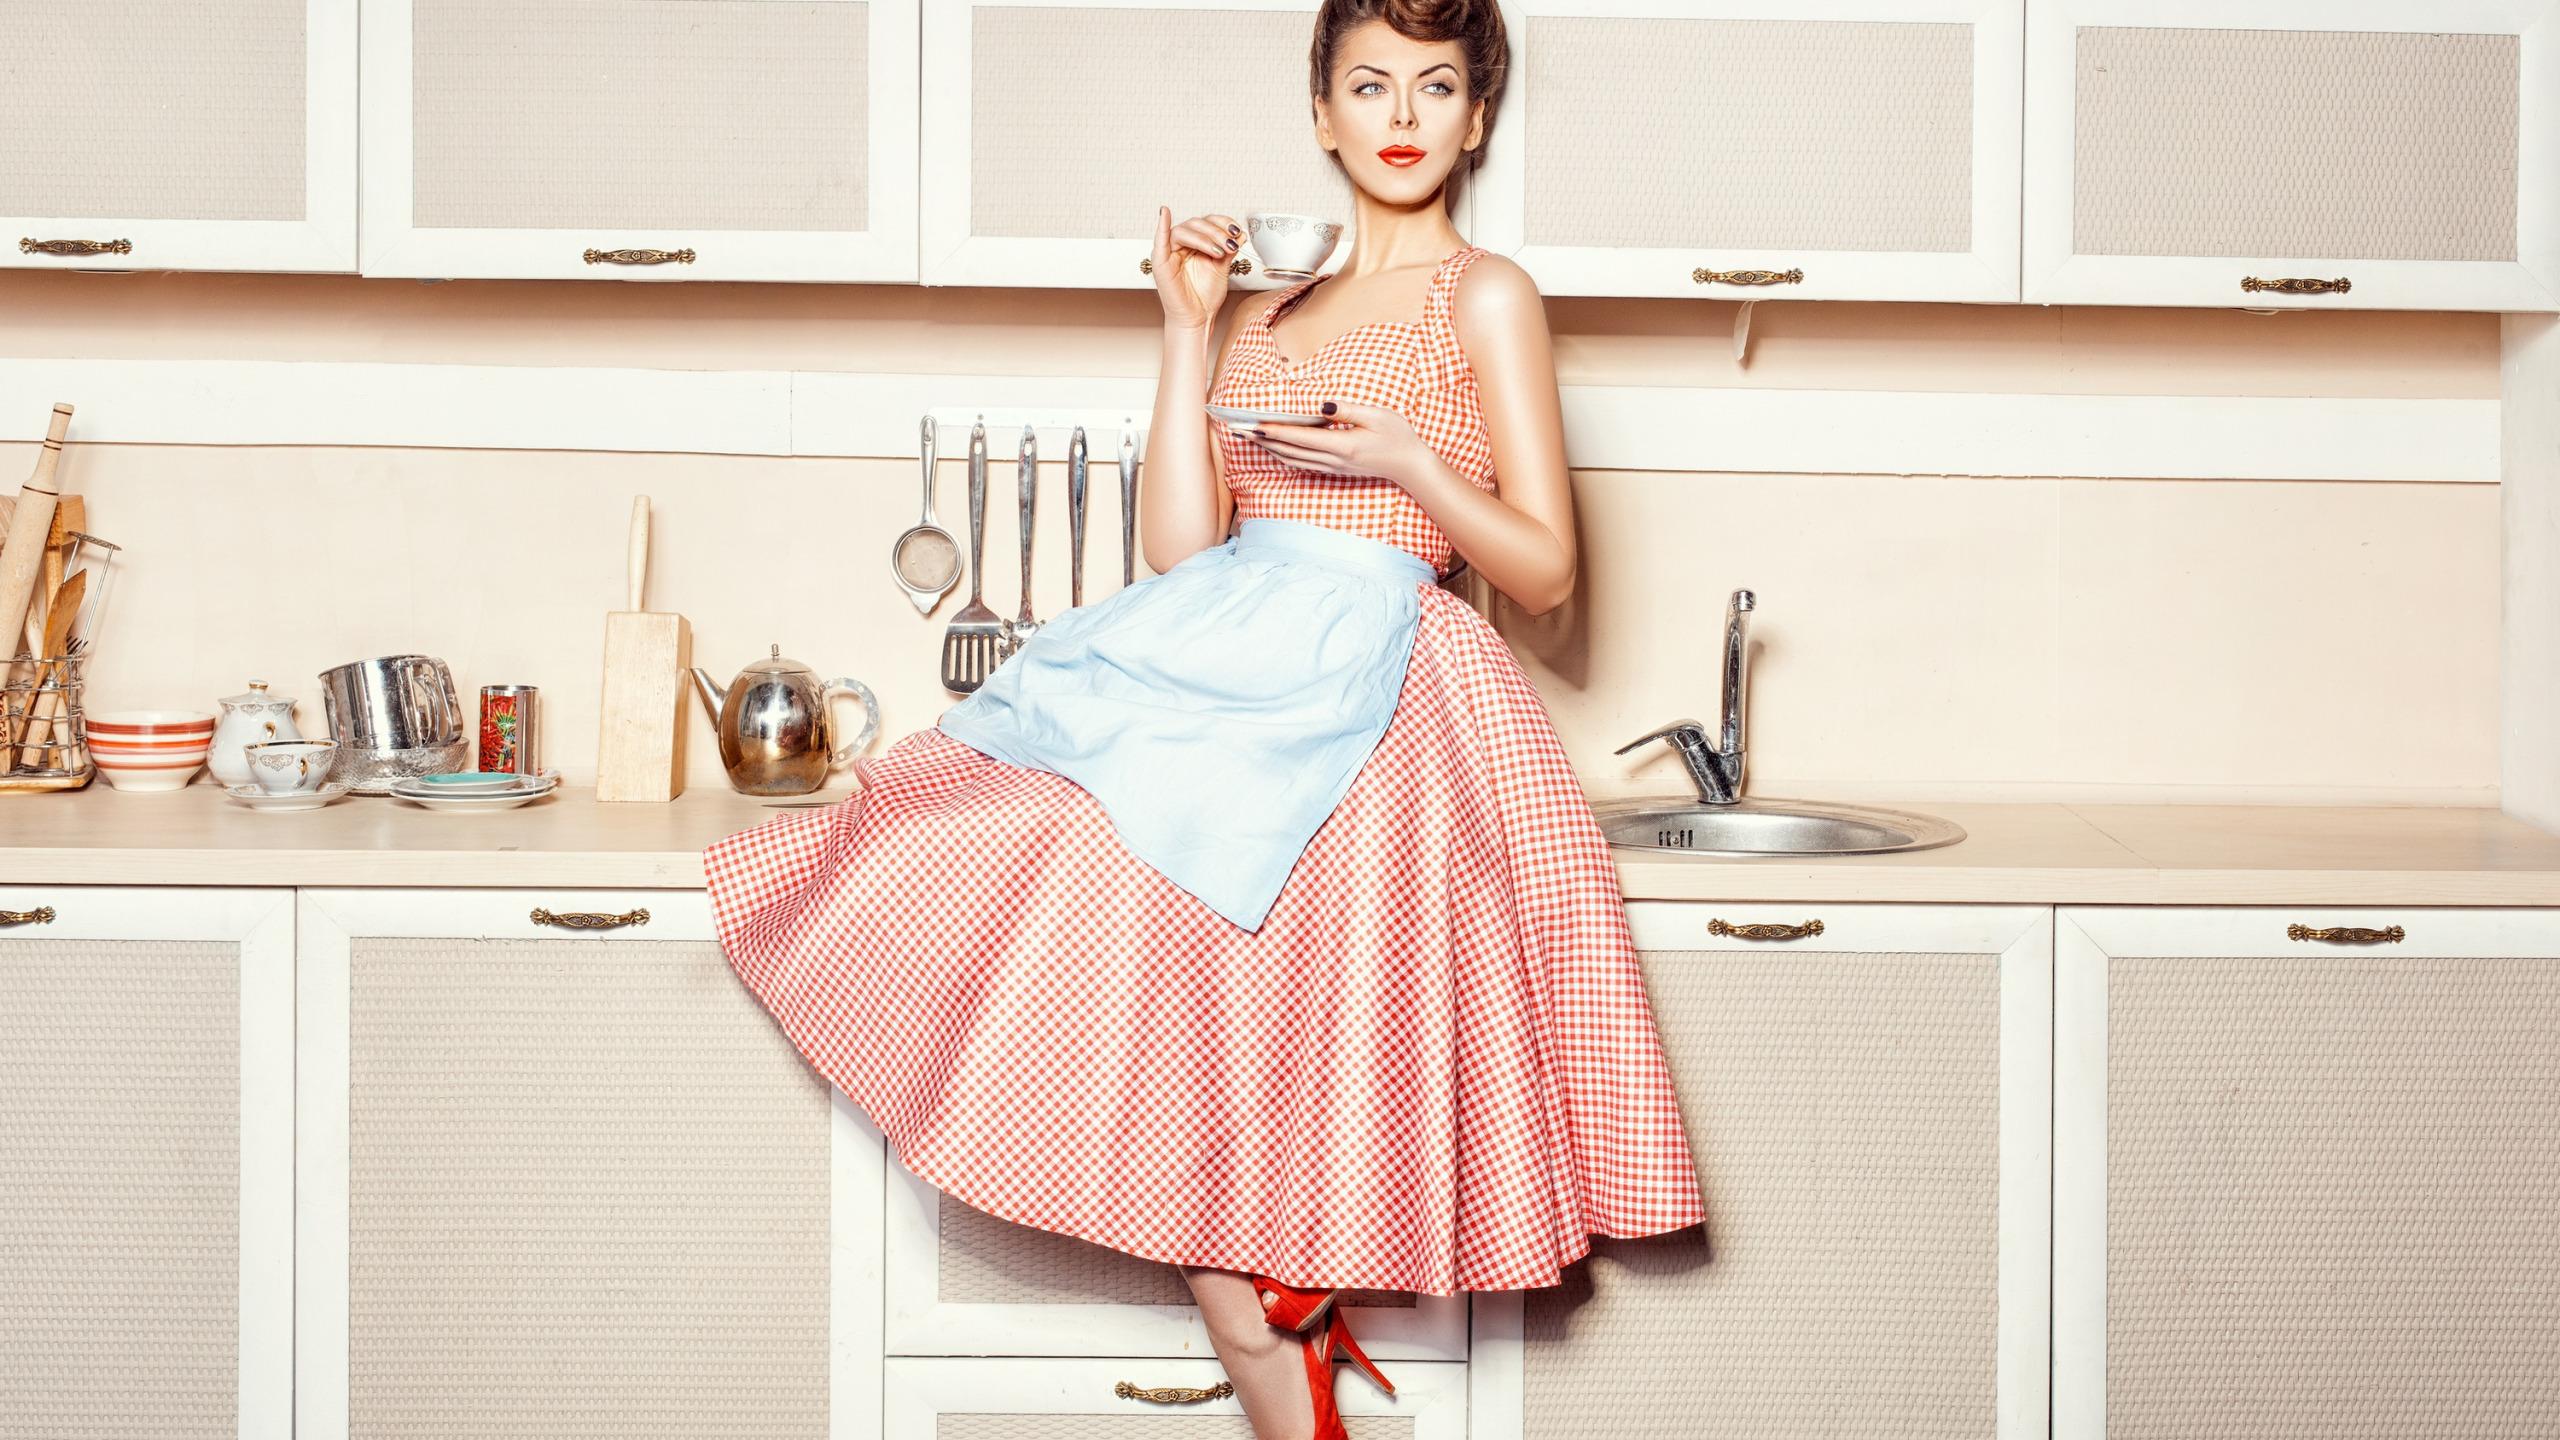 Днем, картинки девушка на кухне